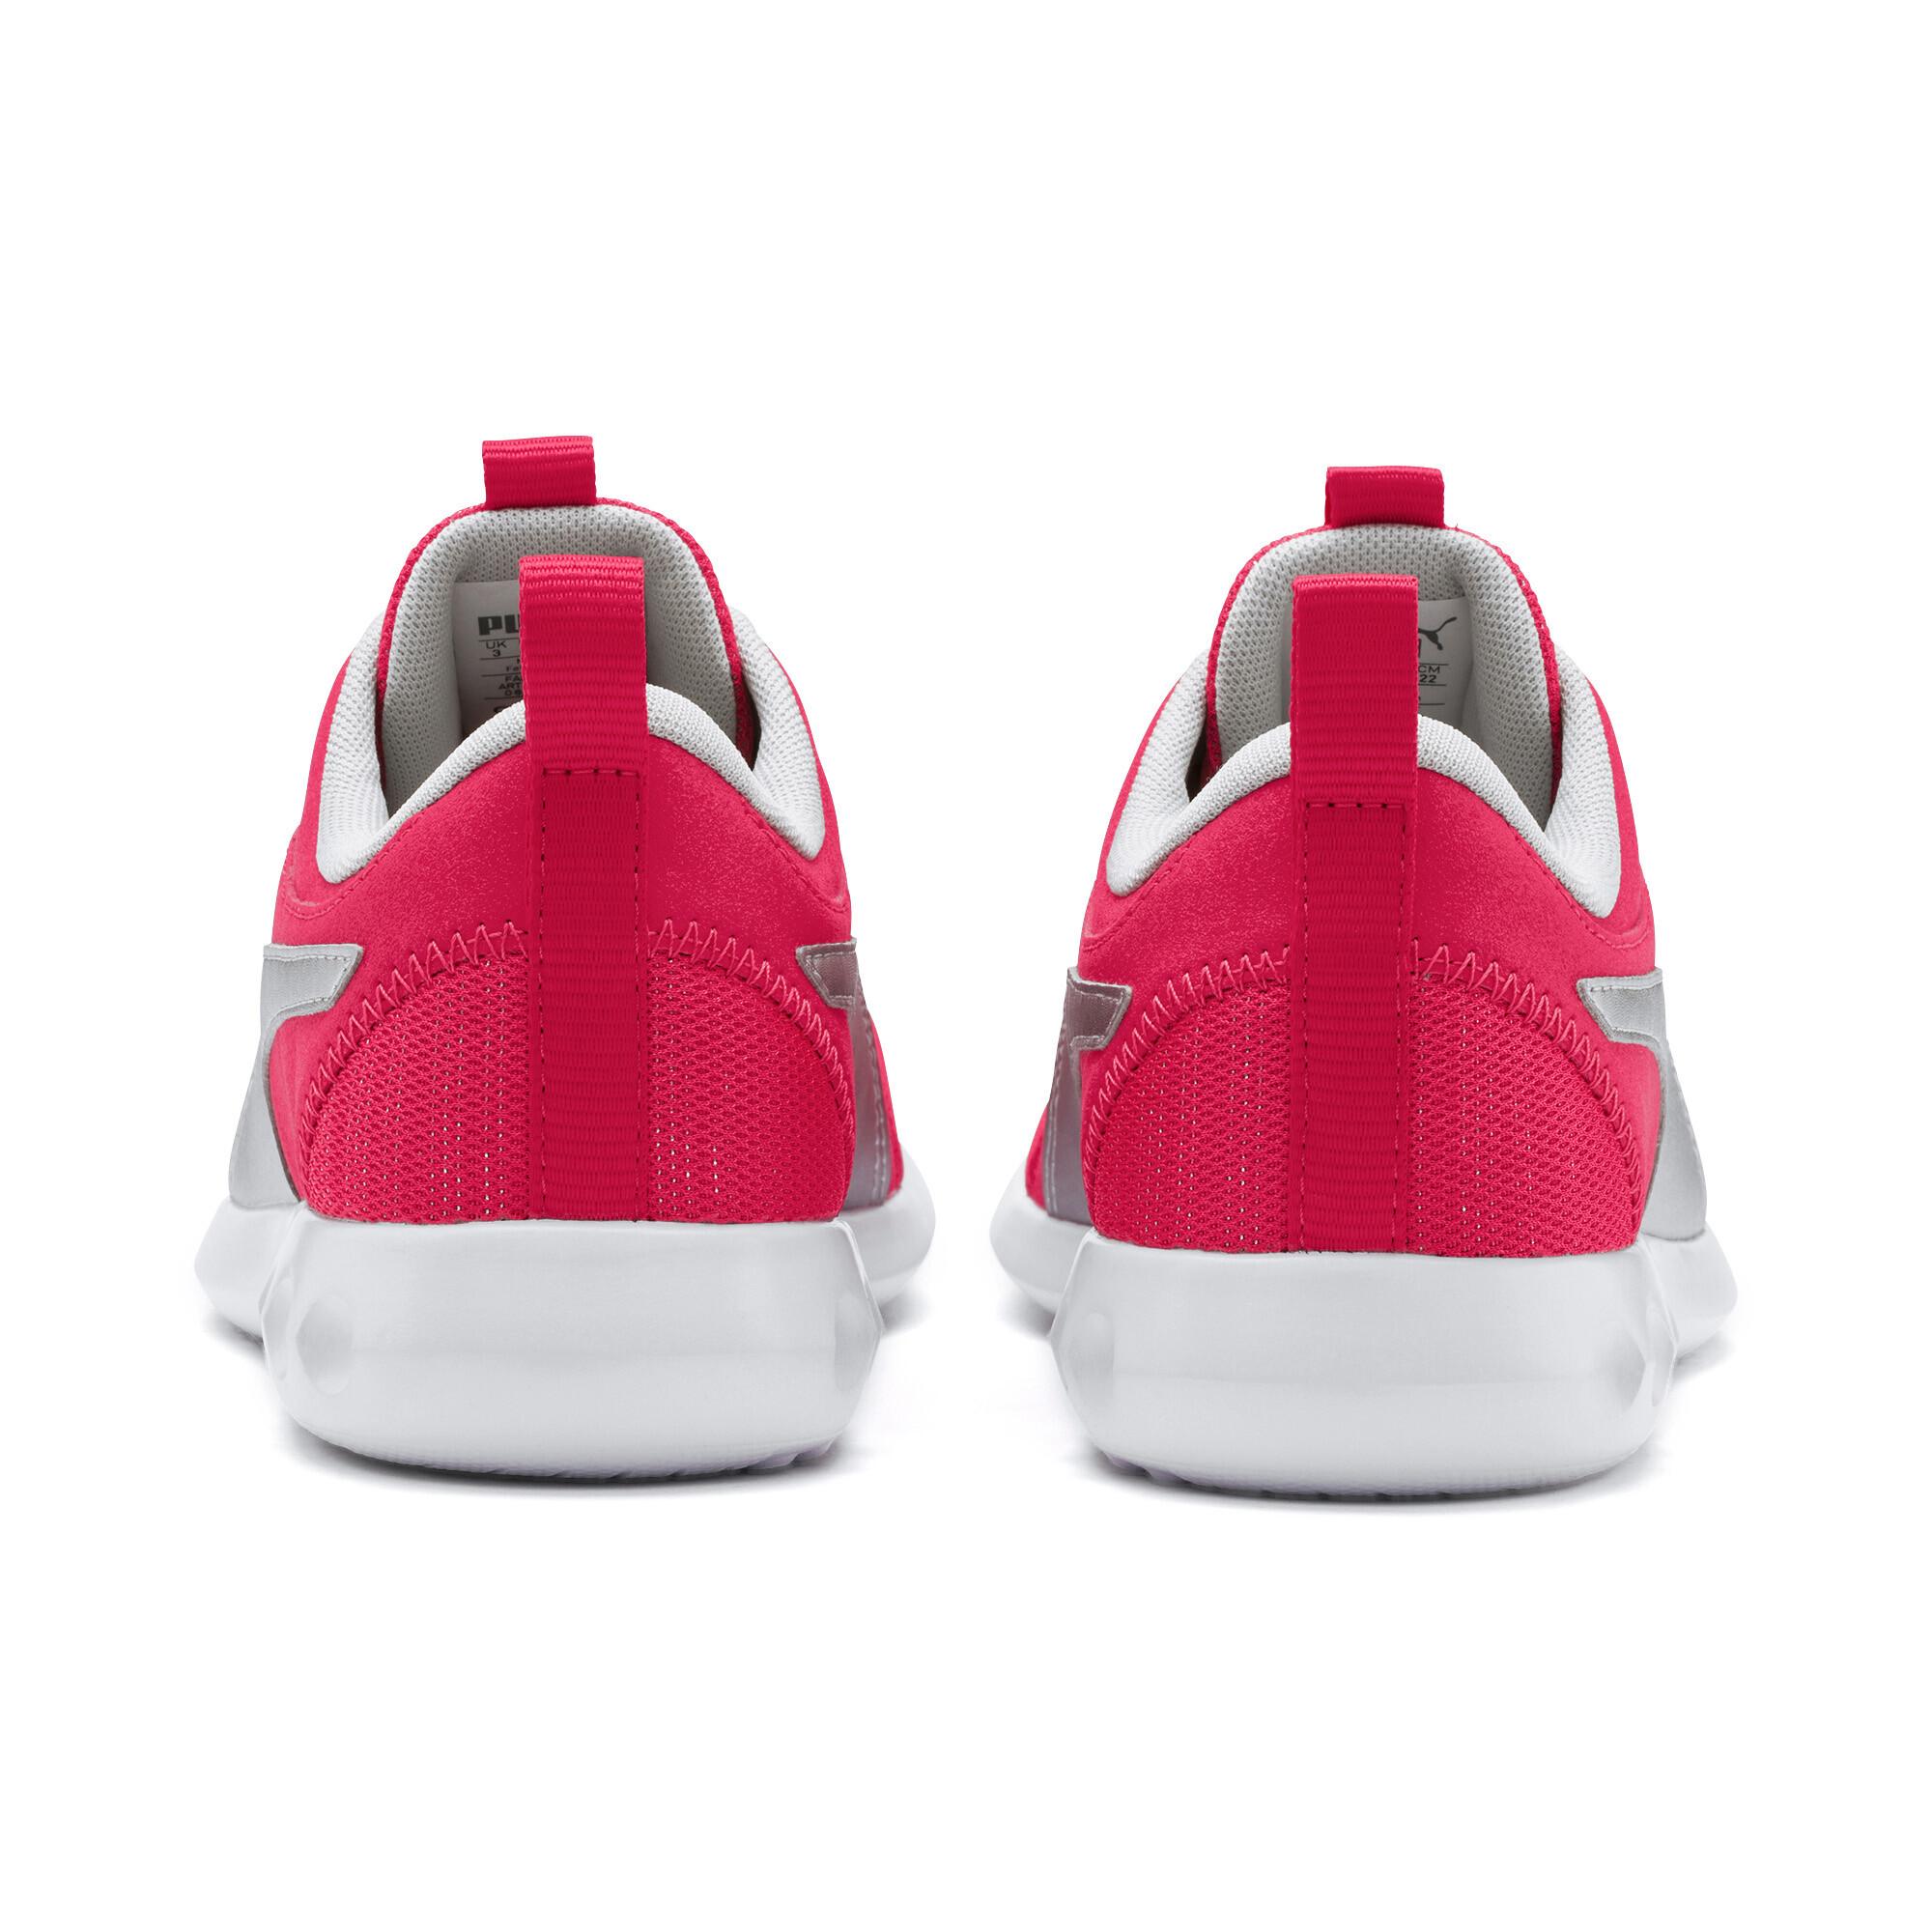 PUMA-Carson-2-Glitz-Shoes-JR-Girls-Shoe-Kids thumbnail 3